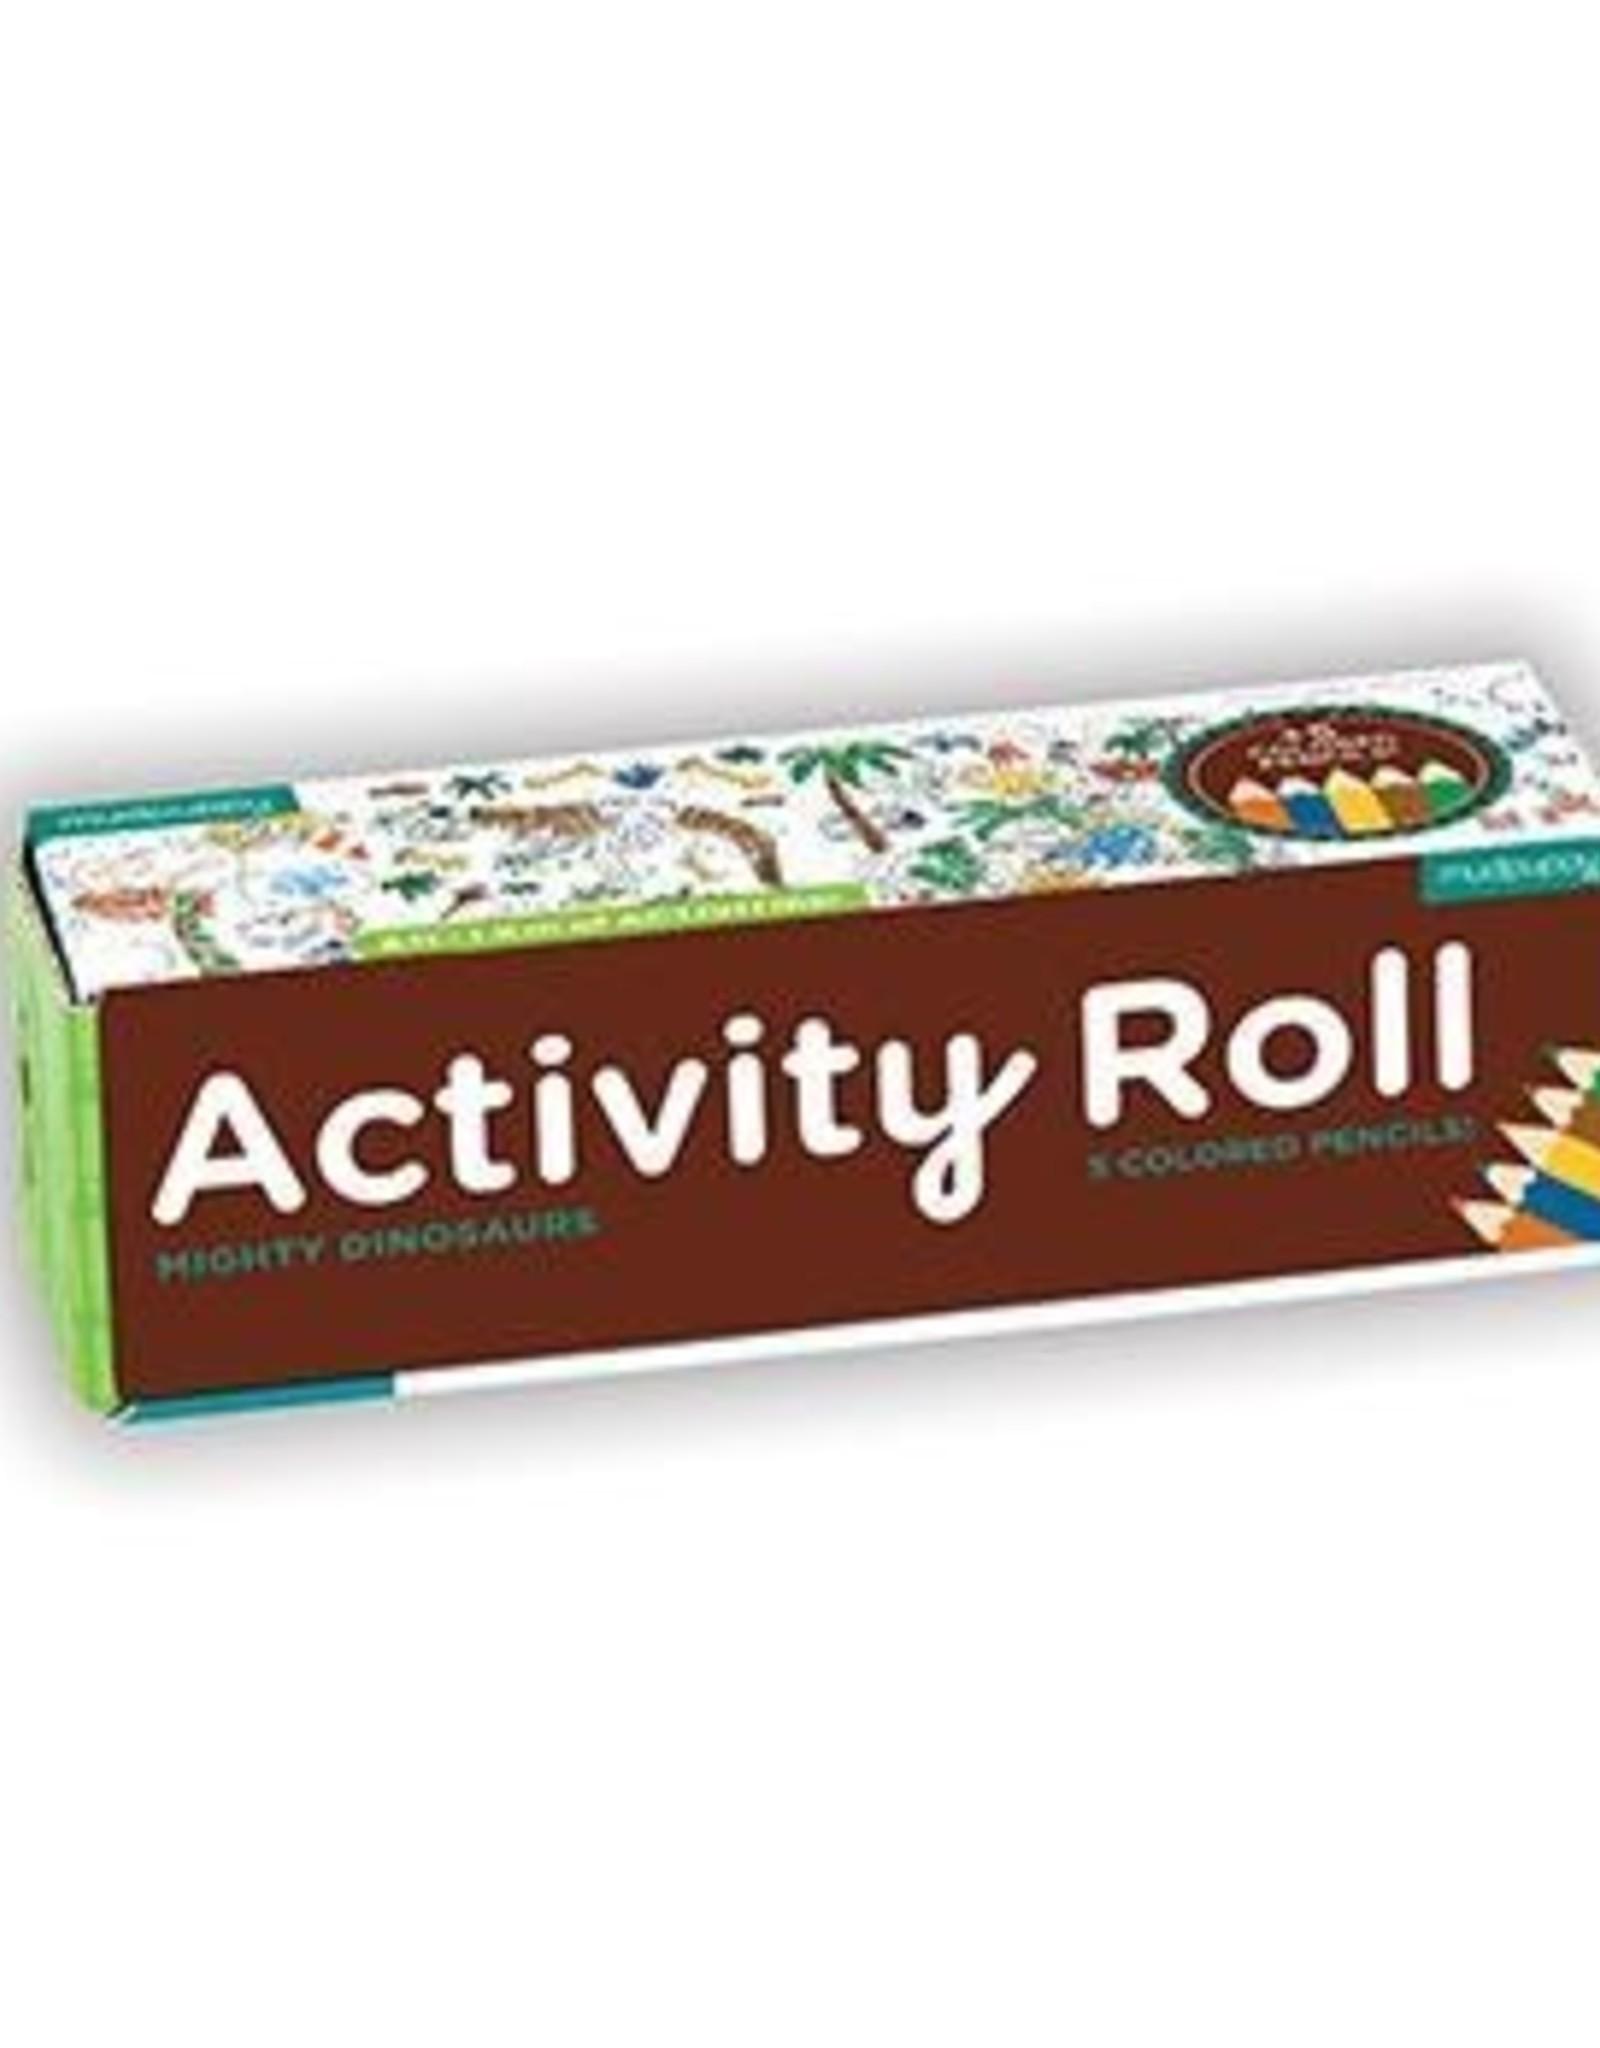 Chronicle Books Activity Roll: Mighty Dinosaur